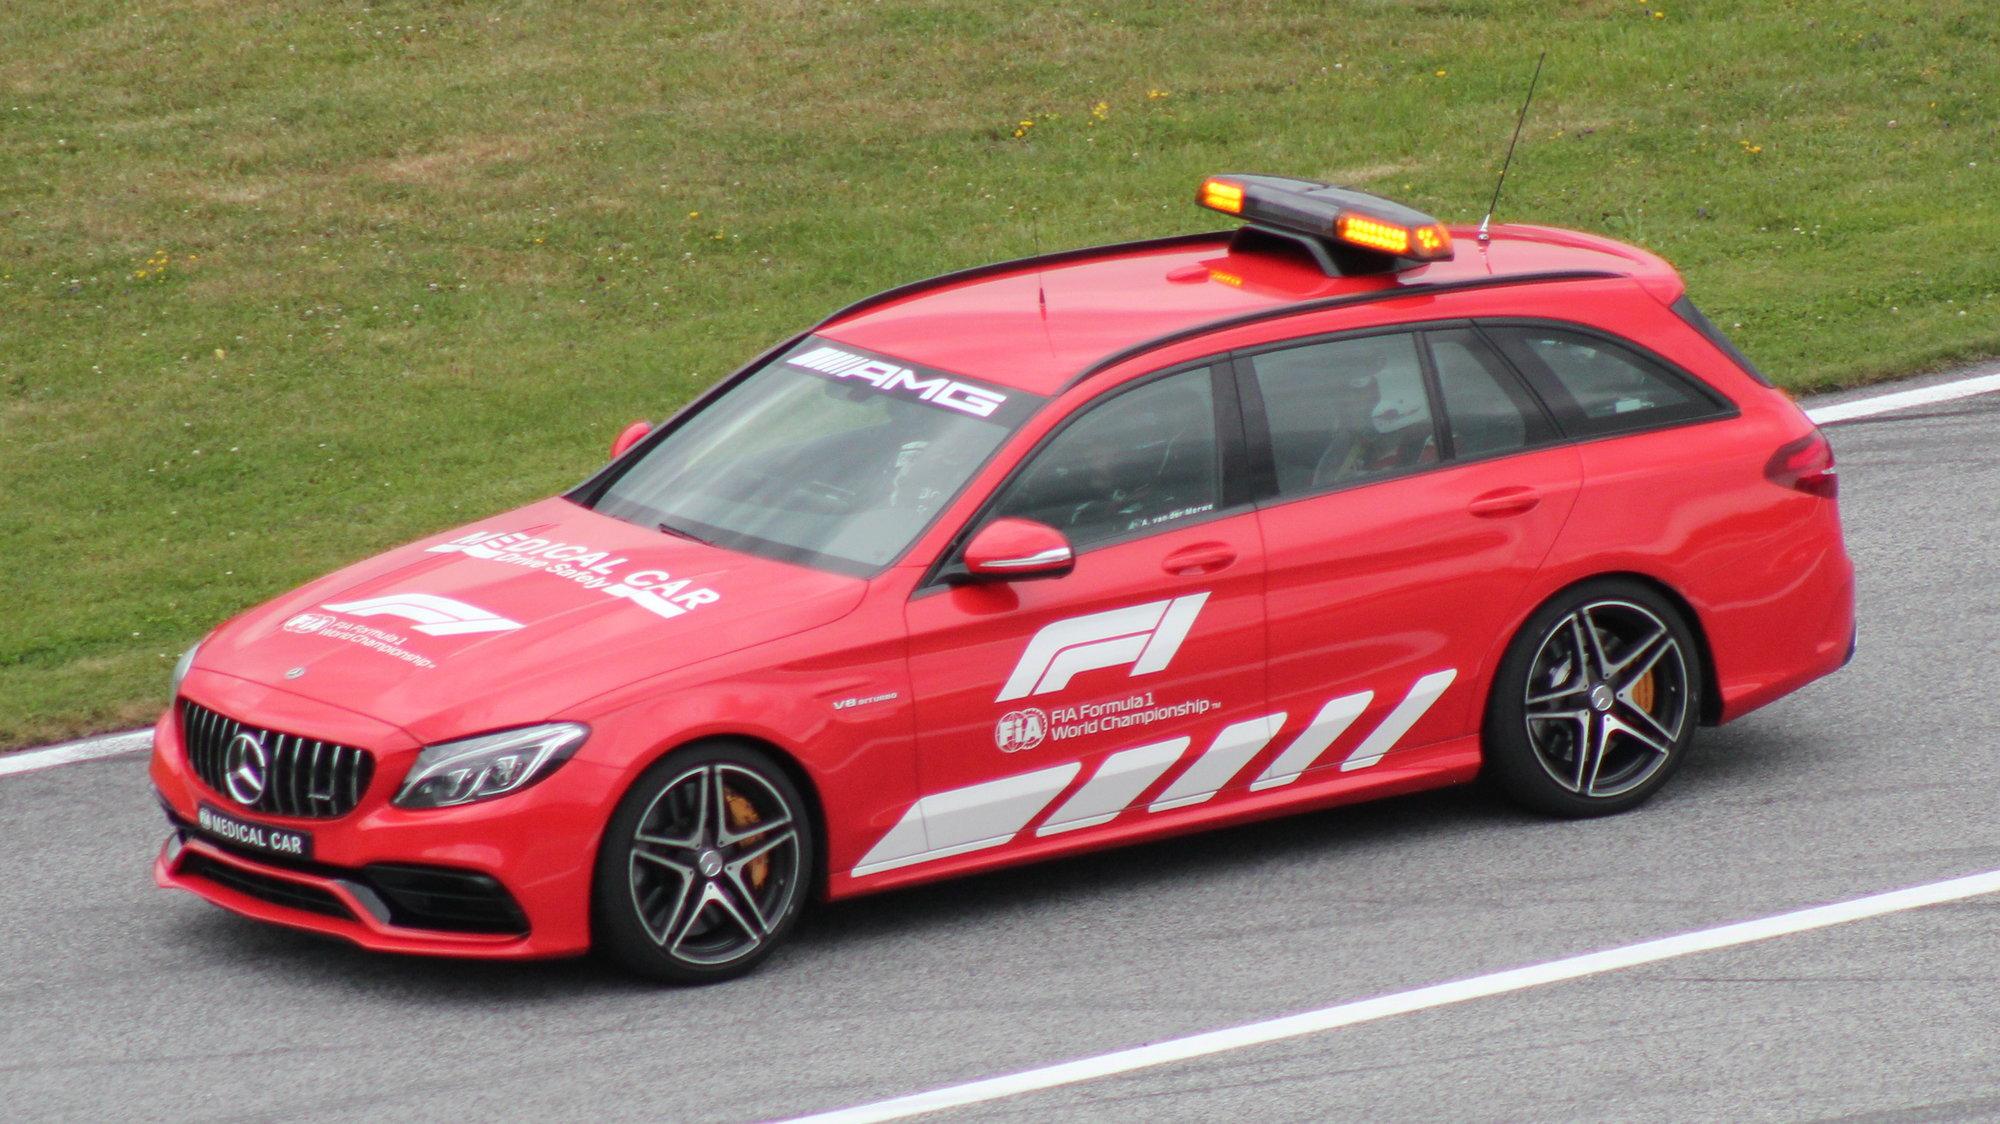 FIA_F1_Austria_2021_Medical_Car_(Mercedes).thumb.jpg.e52e988590ba3d4463a3c905e097a01a.jpg